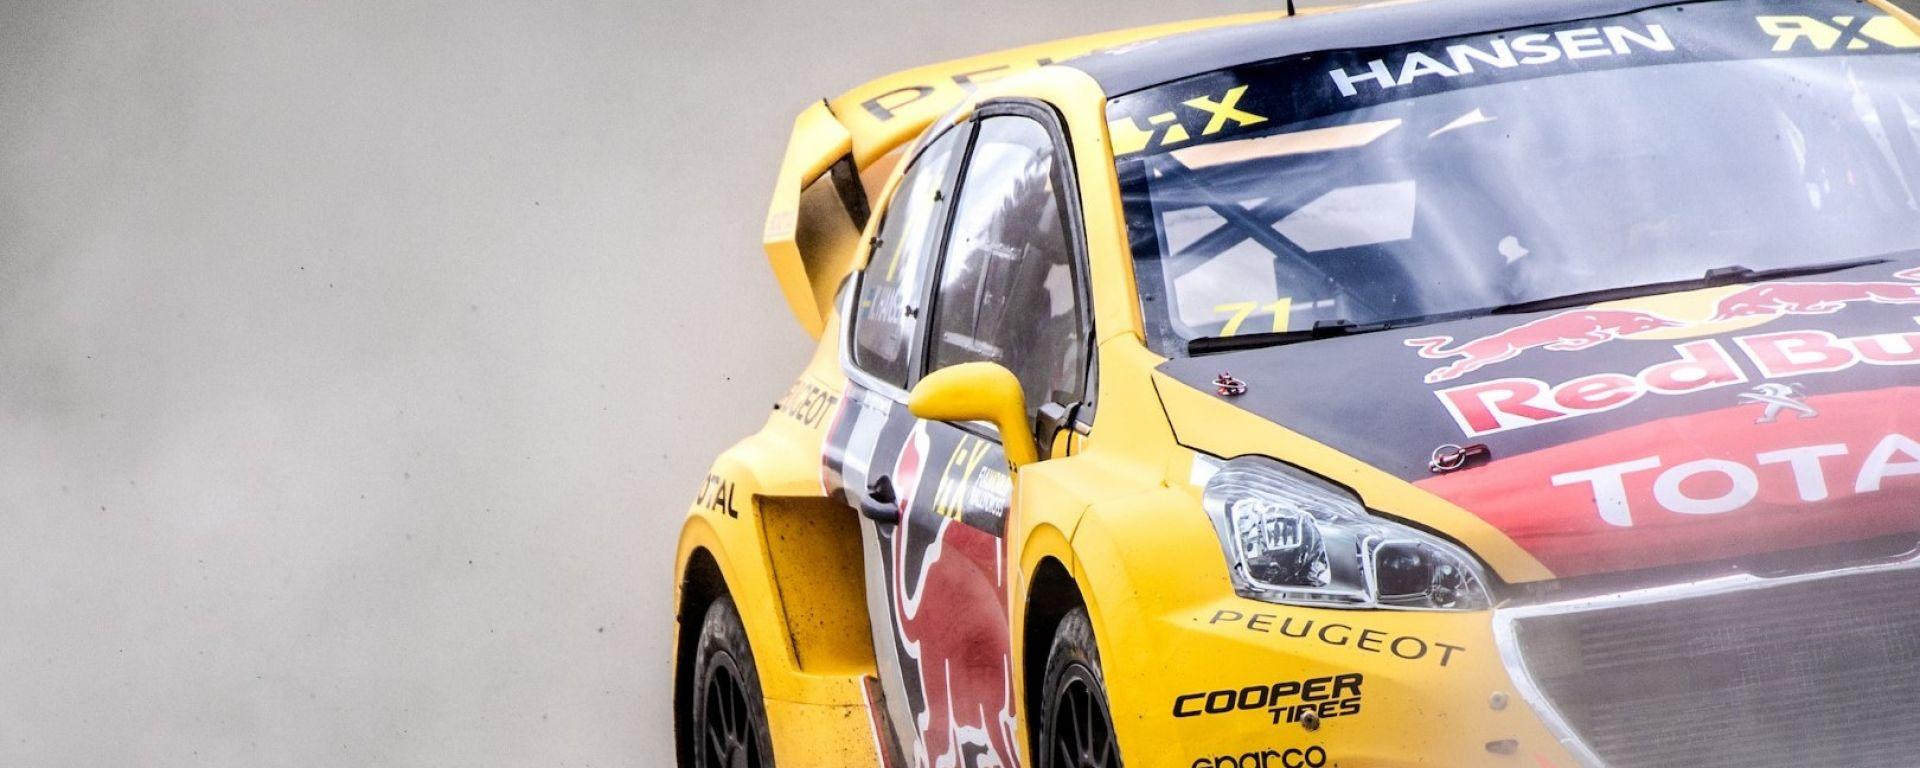 Rallycross 2018: Peugeot manca il podio al GP di Hell